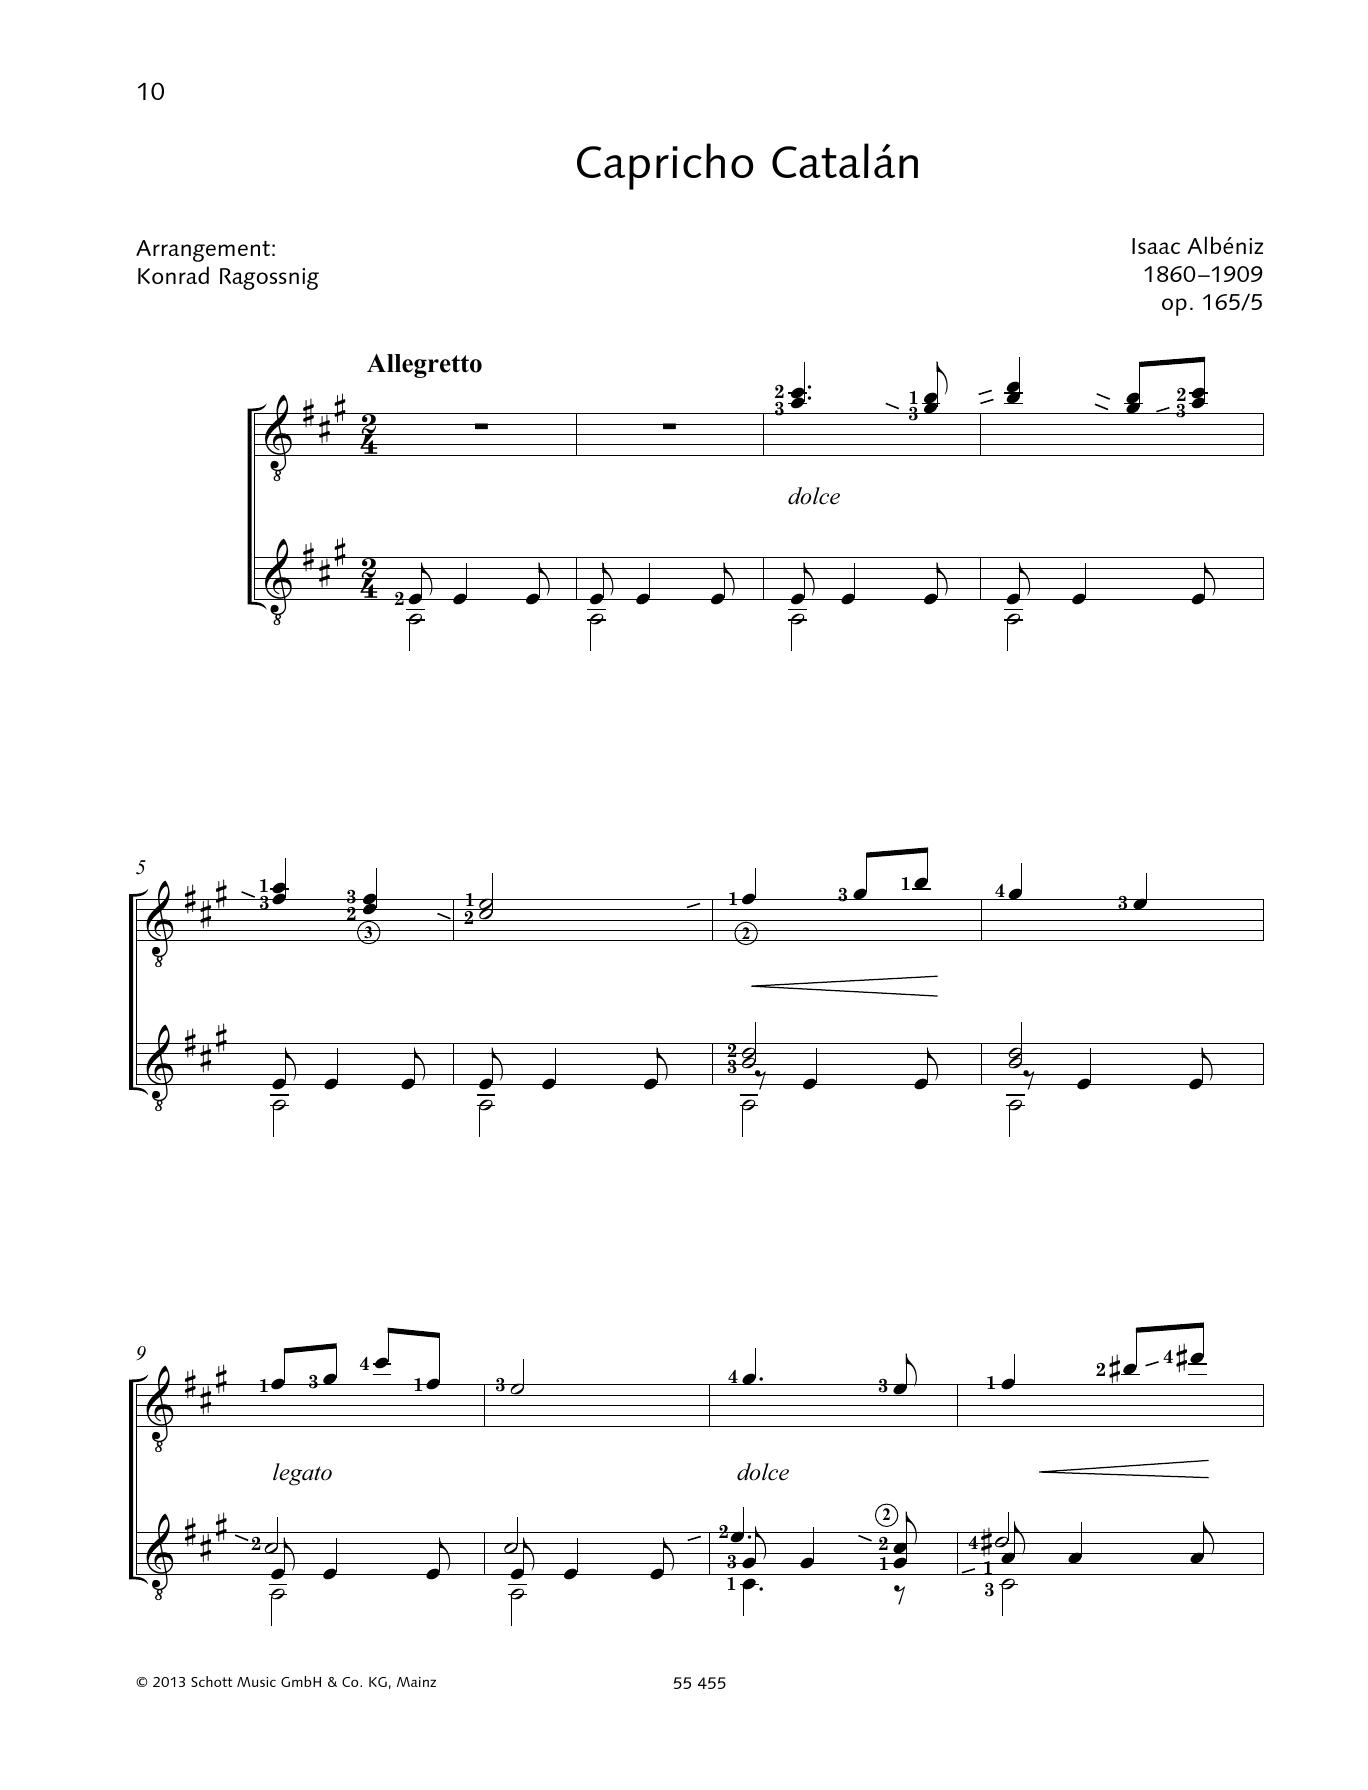 Capricho Catalán - Full Score Sheet Music